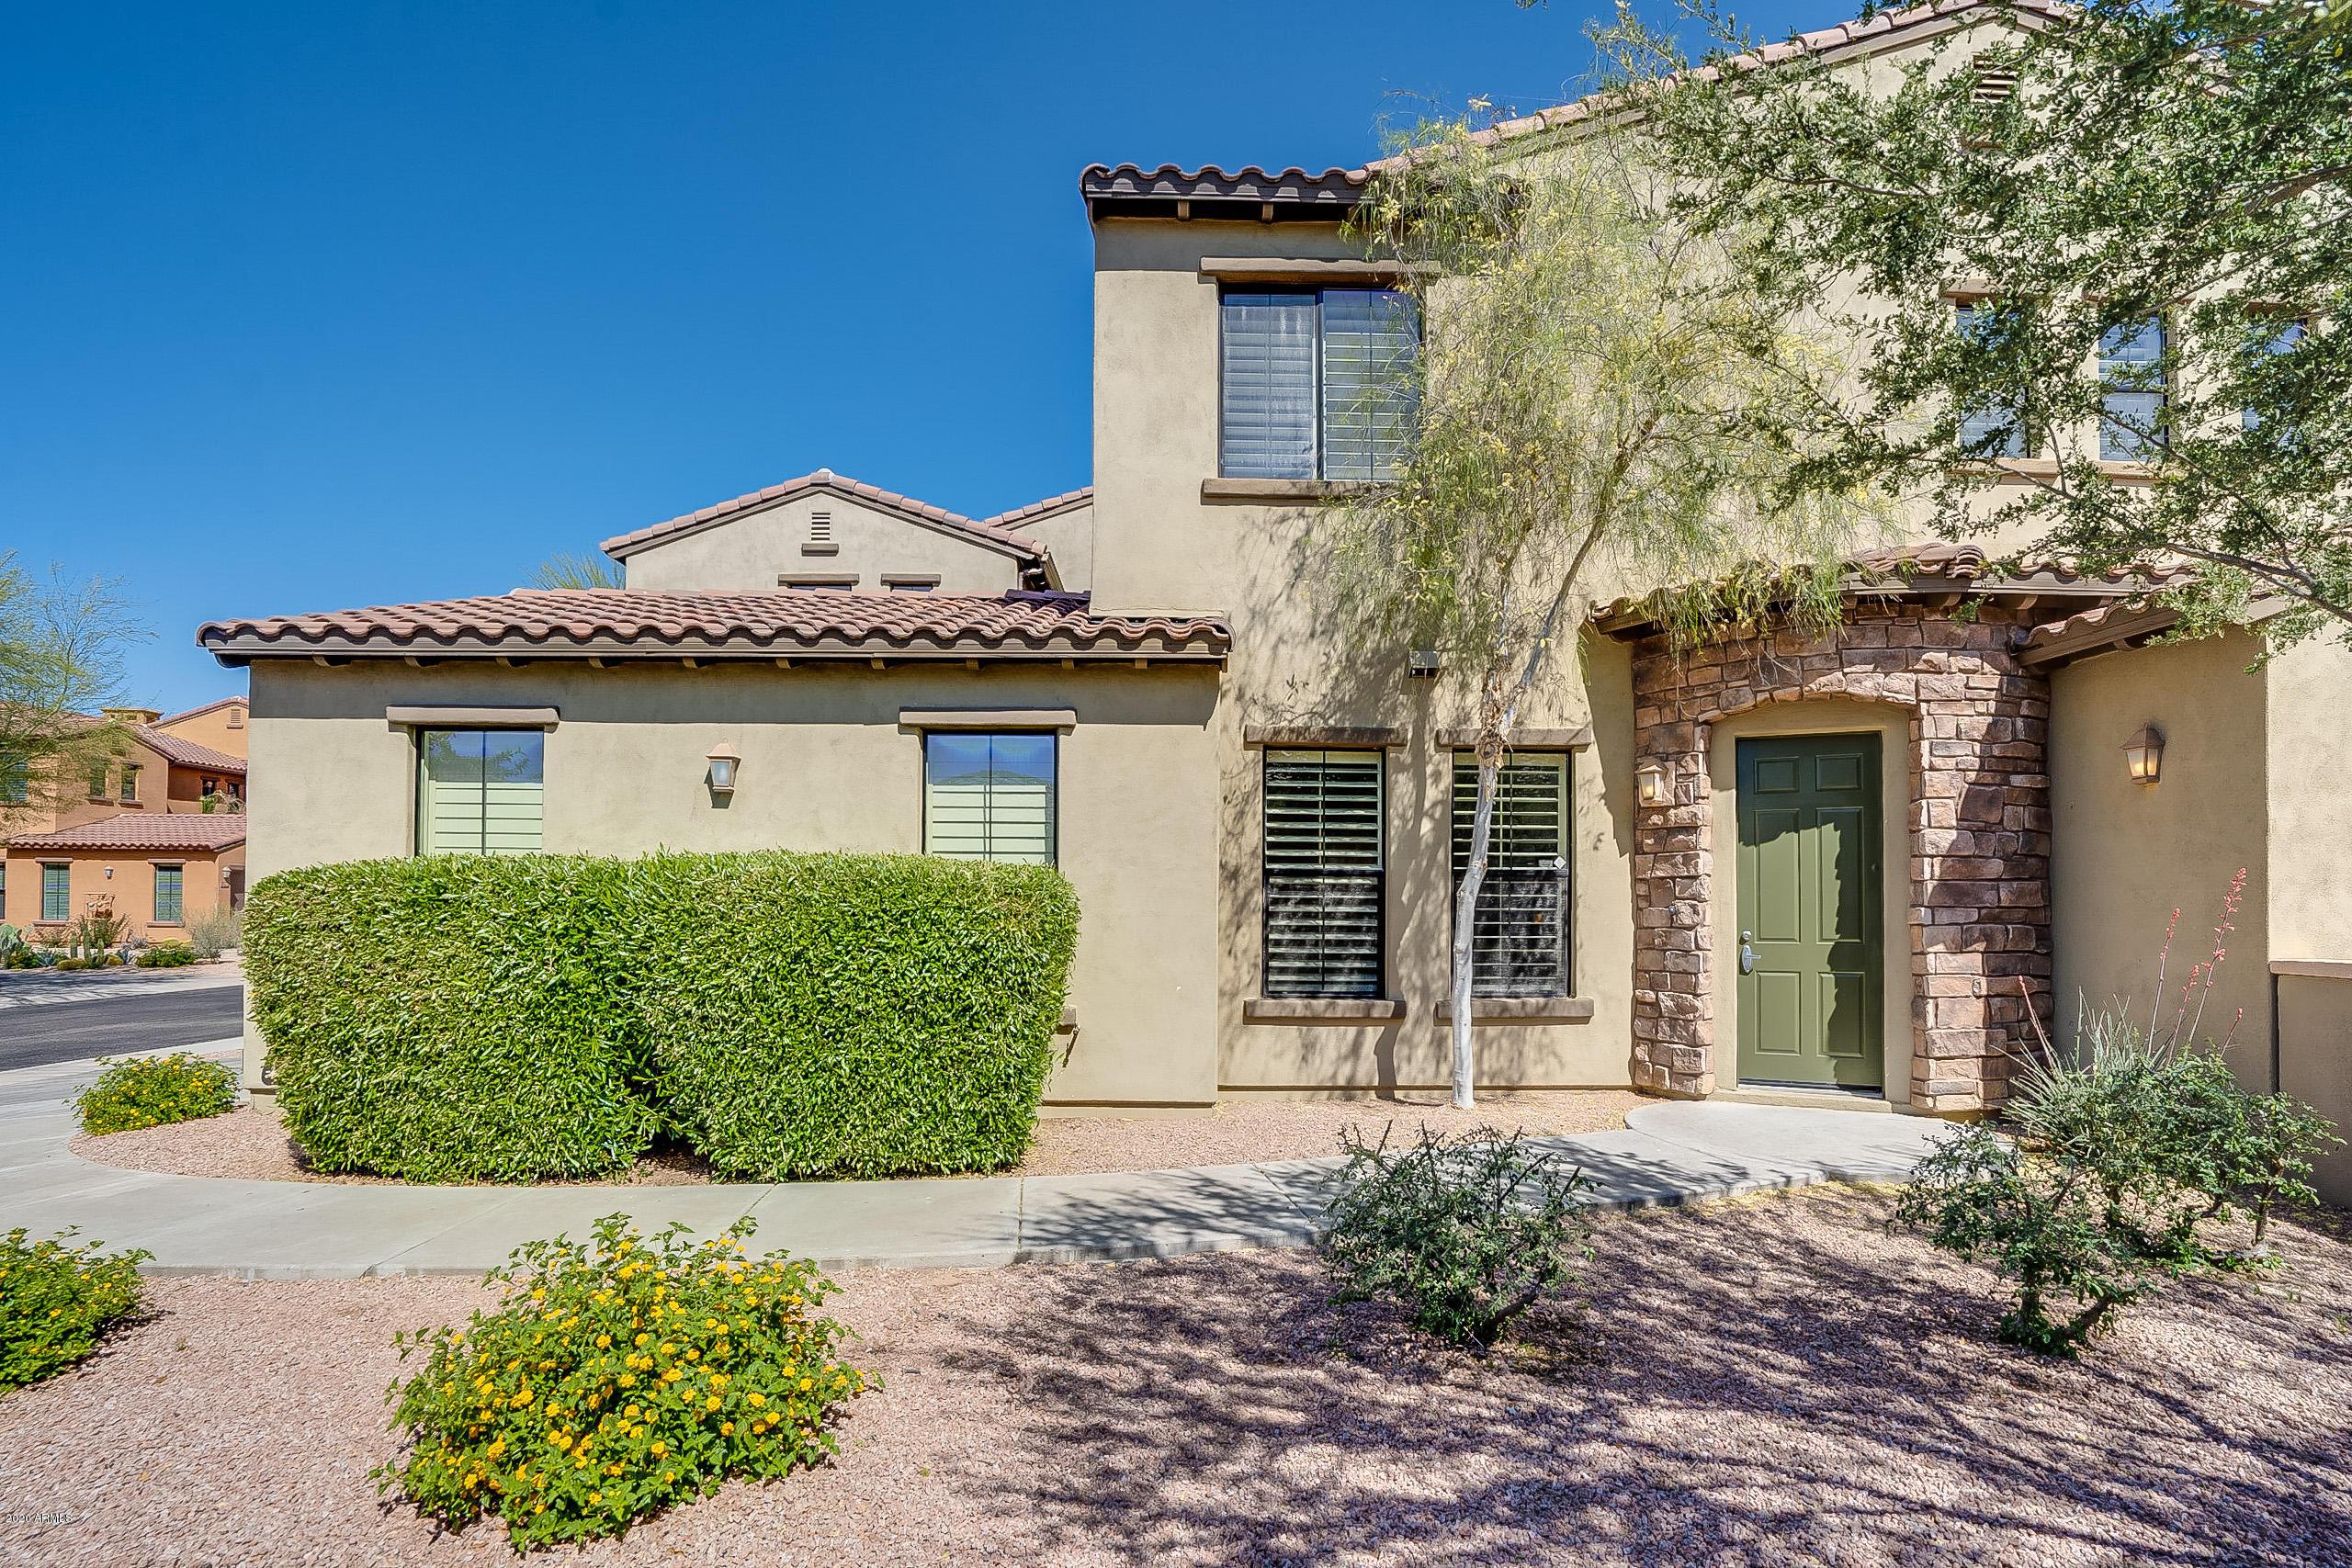 Photo of 20750 N 87TH Street #1106, Scottsdale, AZ 85255